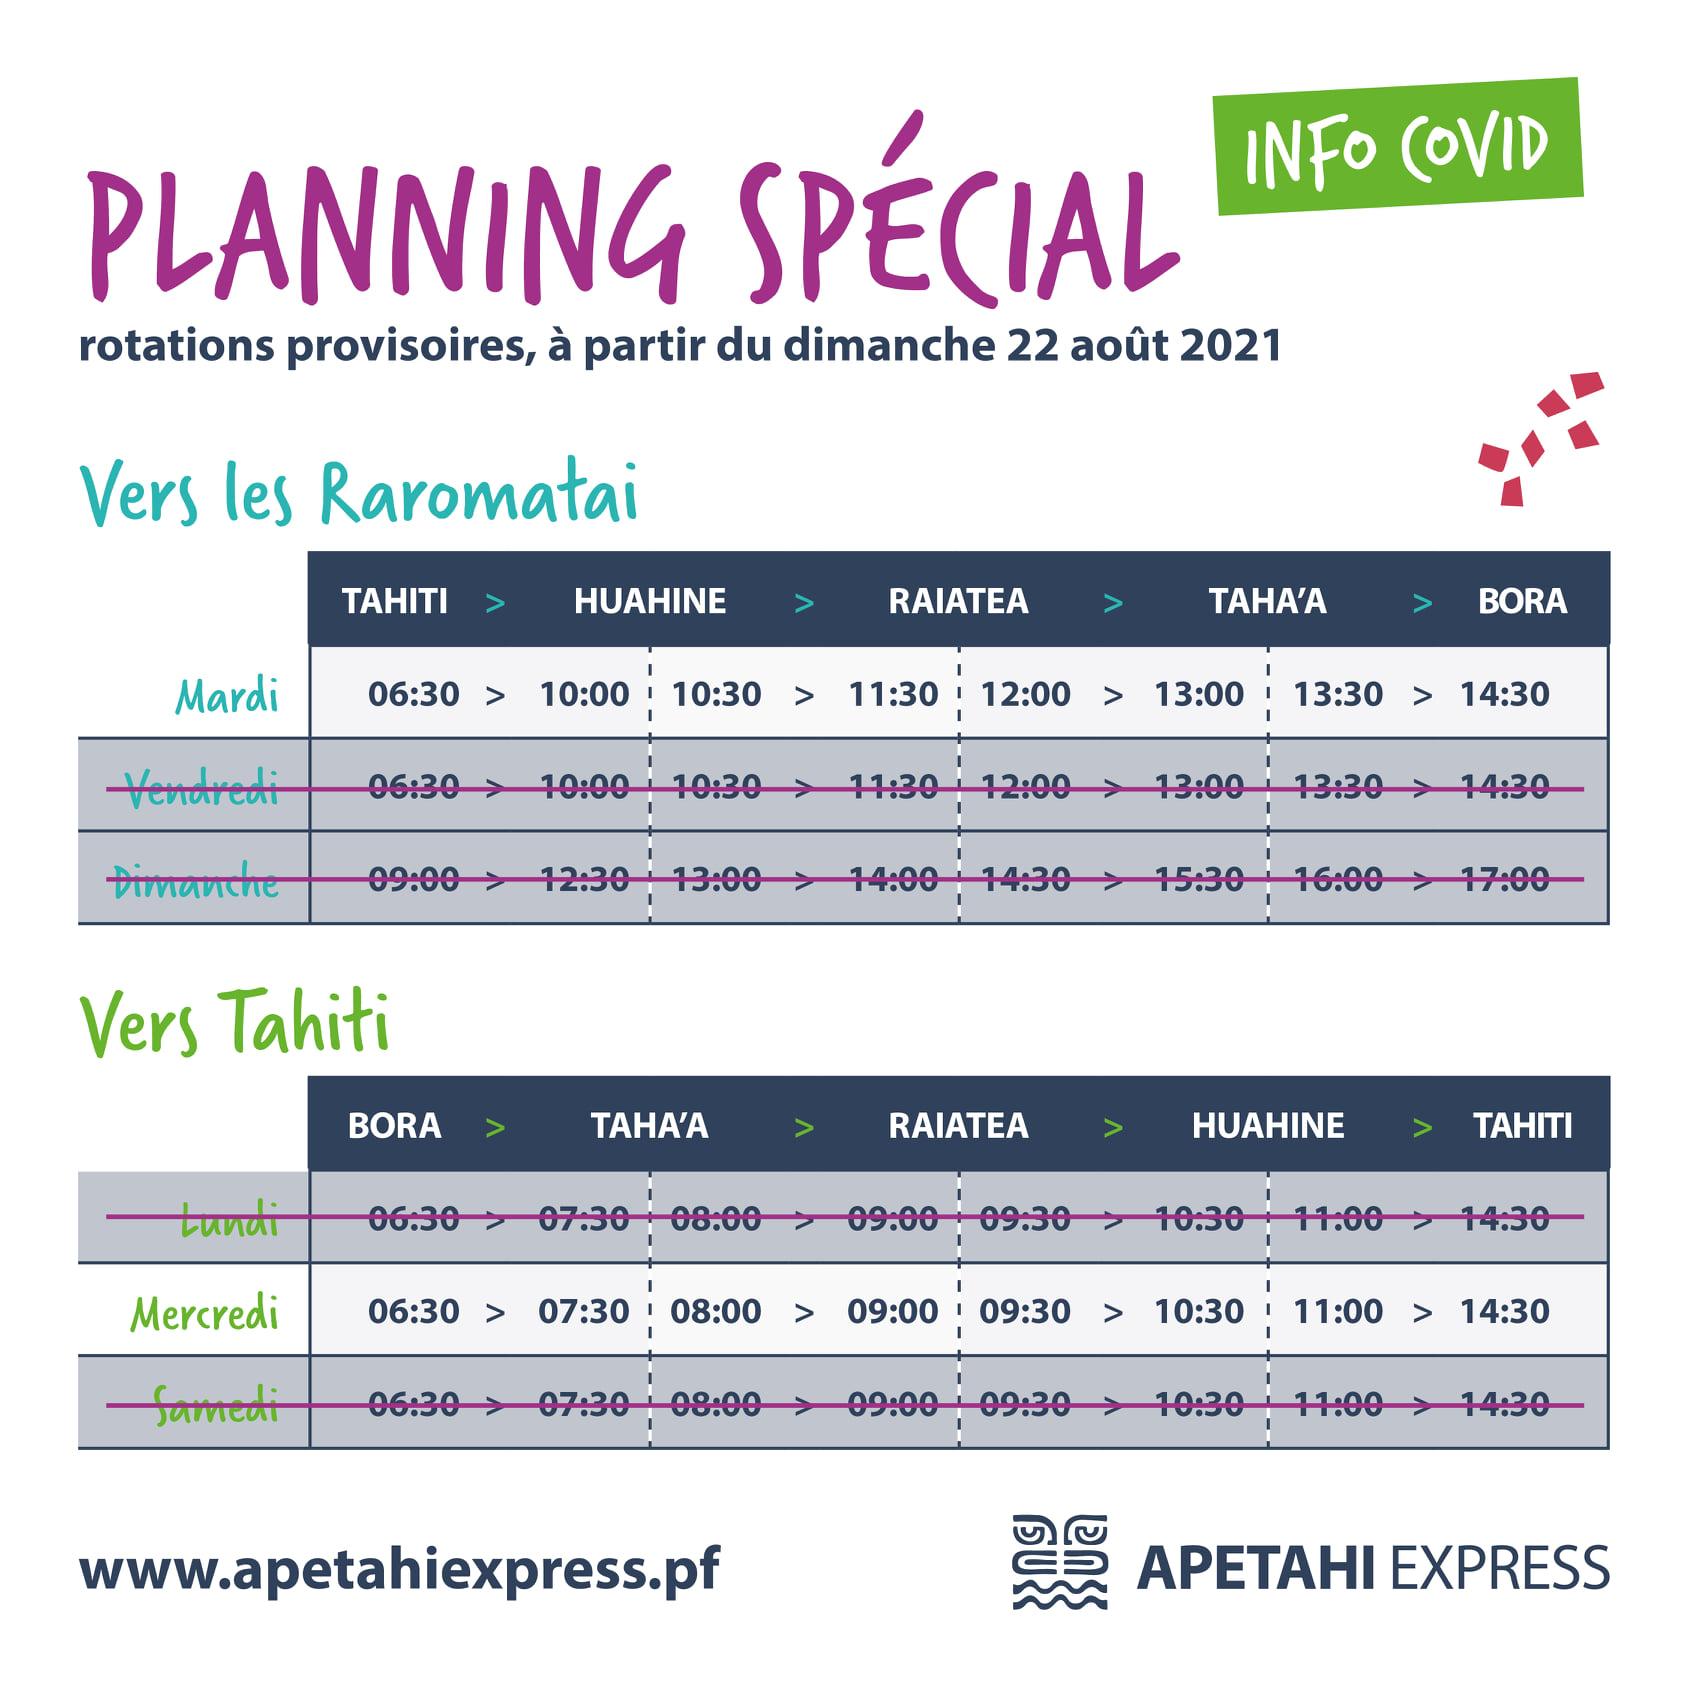 Les horaires - Apetahi Express